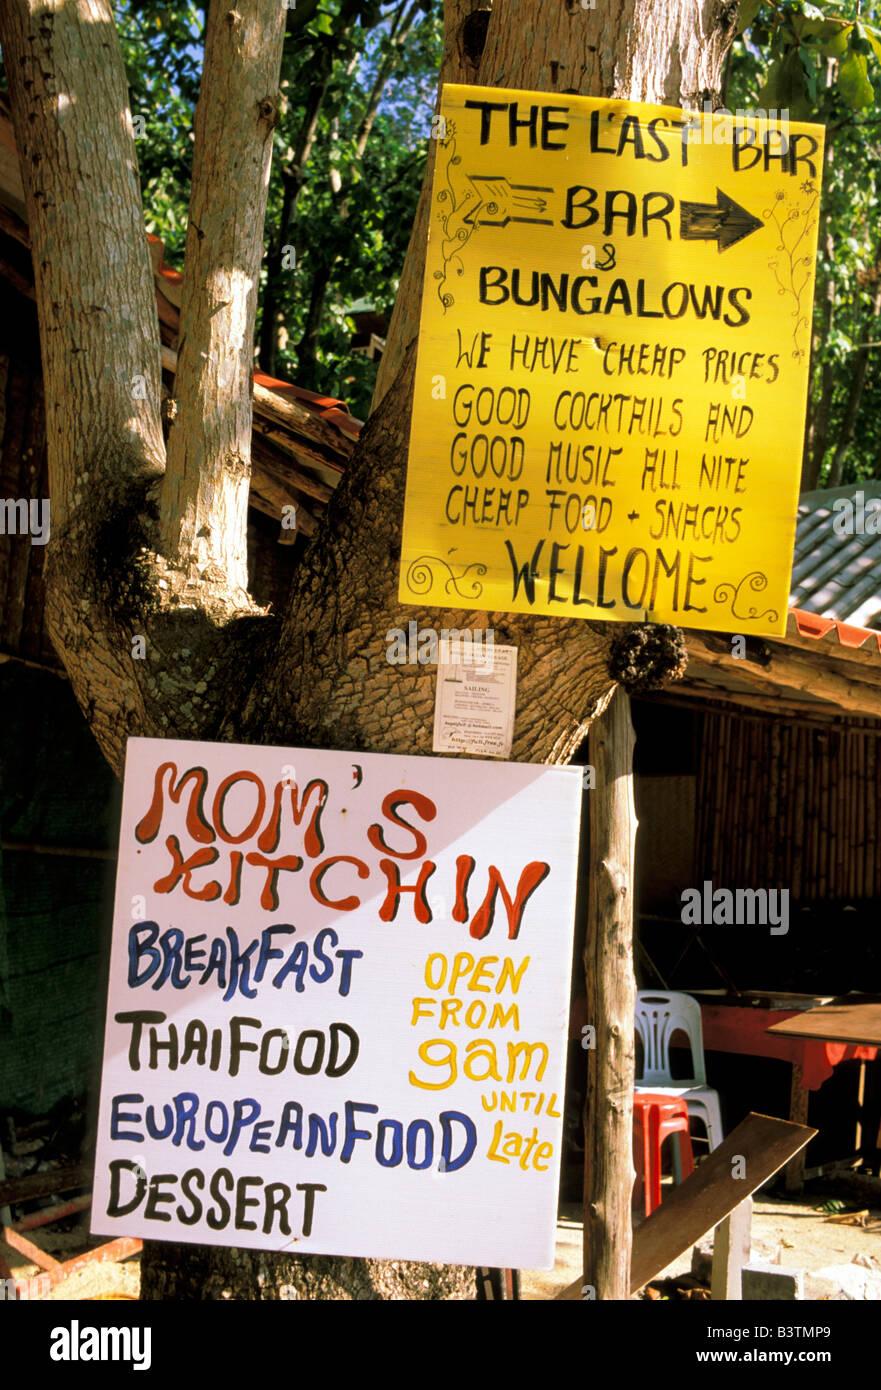 Asia Thailand Krabi East Railay Beach Restaurant Sign